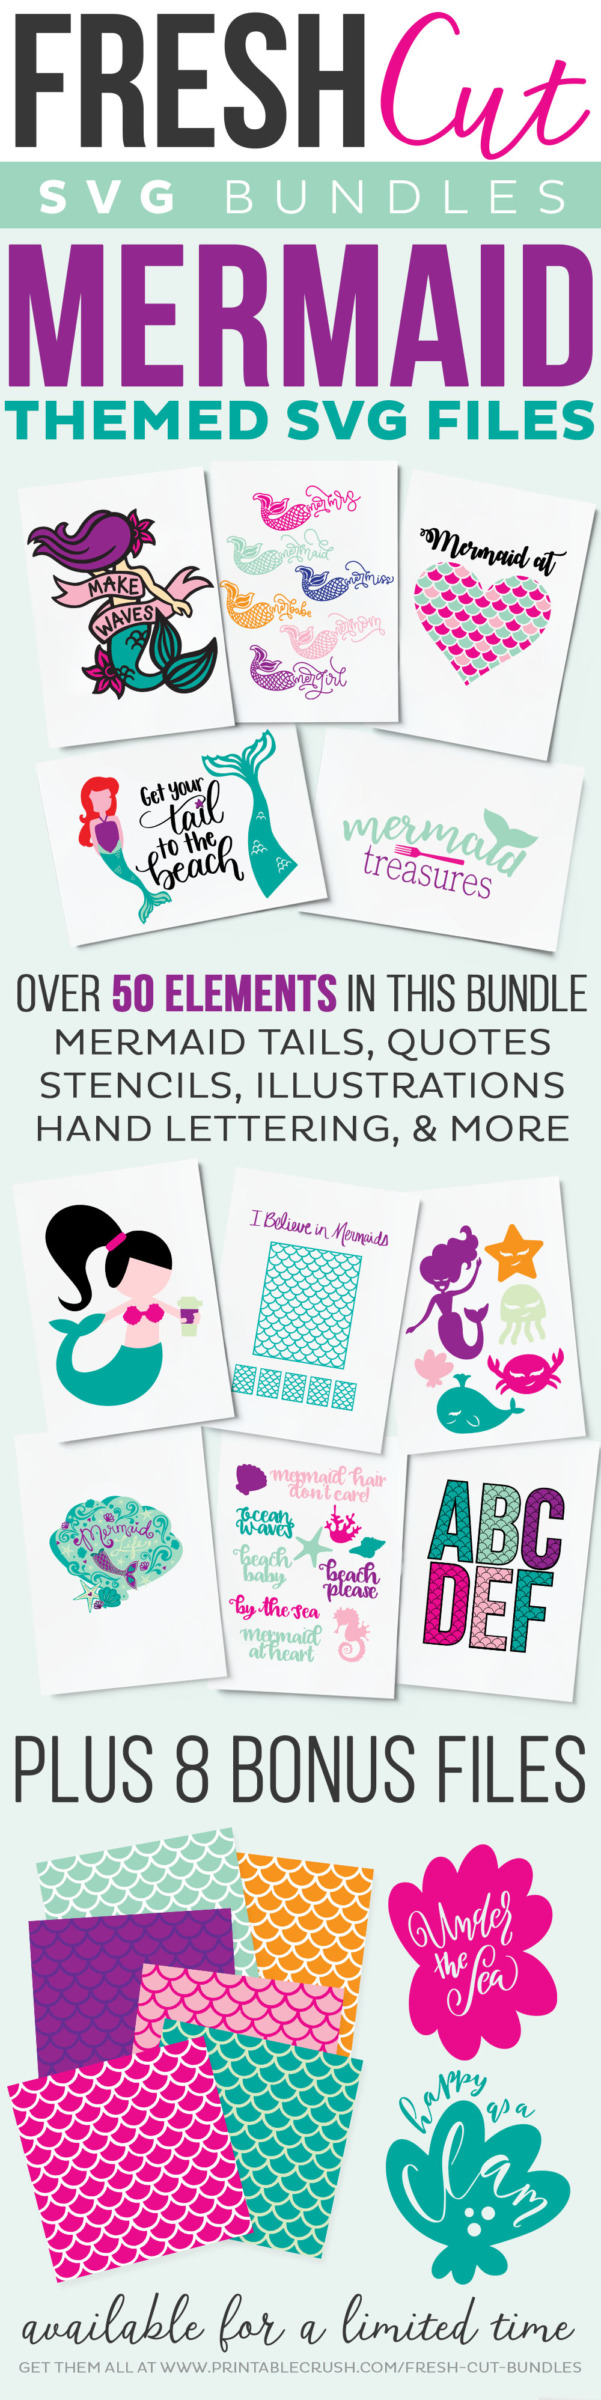 Mermaid themed Fresh Cut SVG Bundle collage of designs